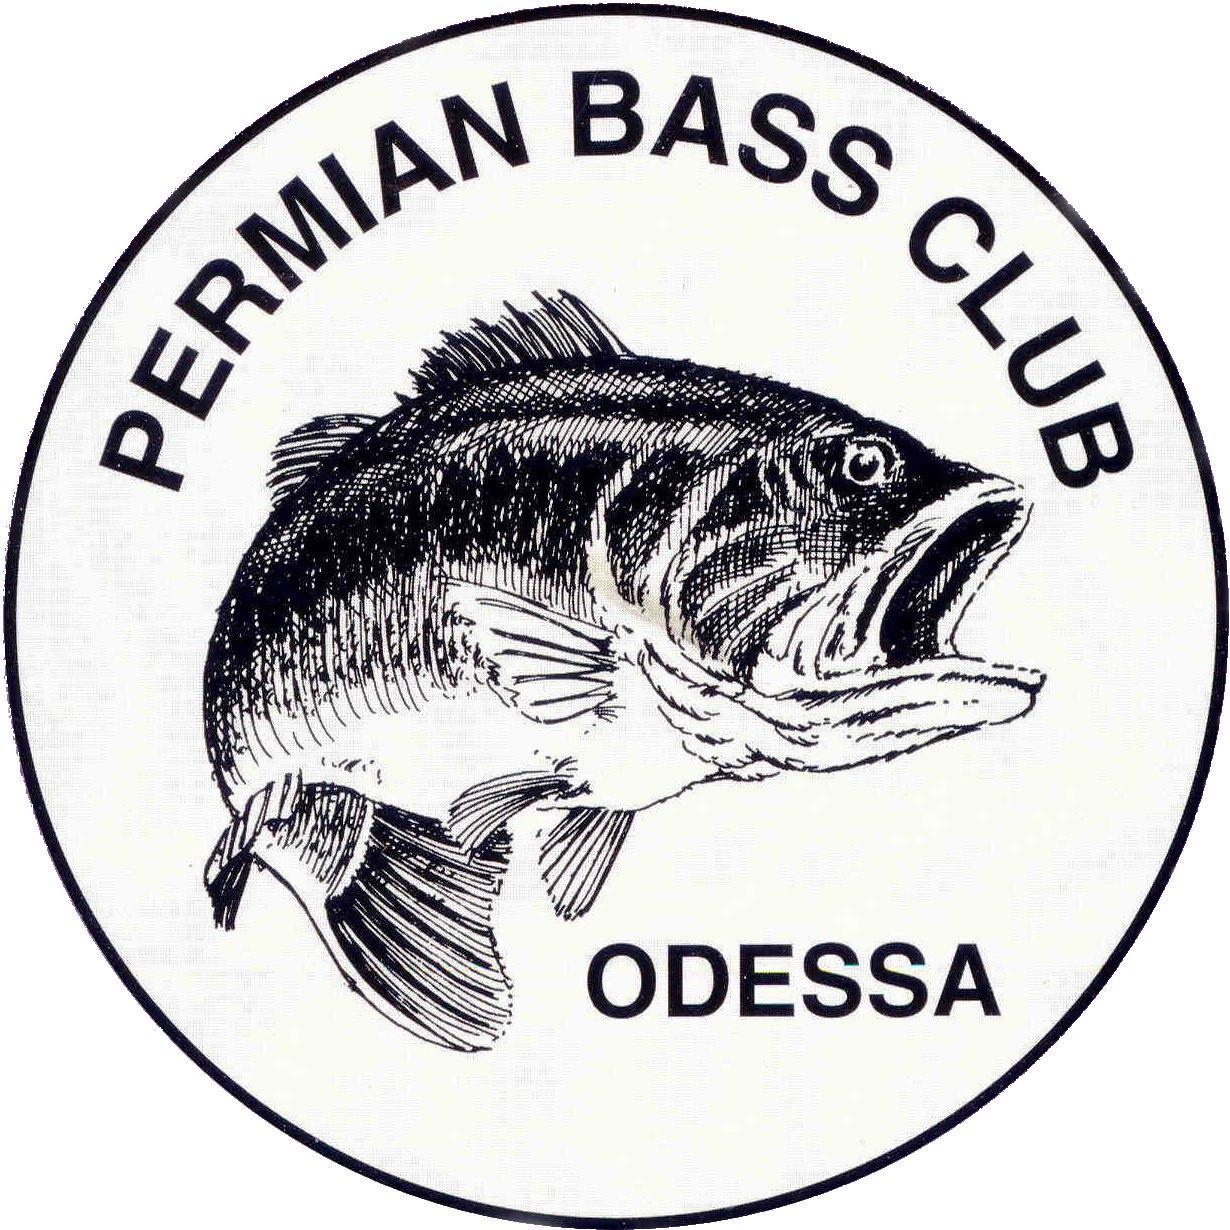 Bass fishing logos images reverse search for Bass fishing logos